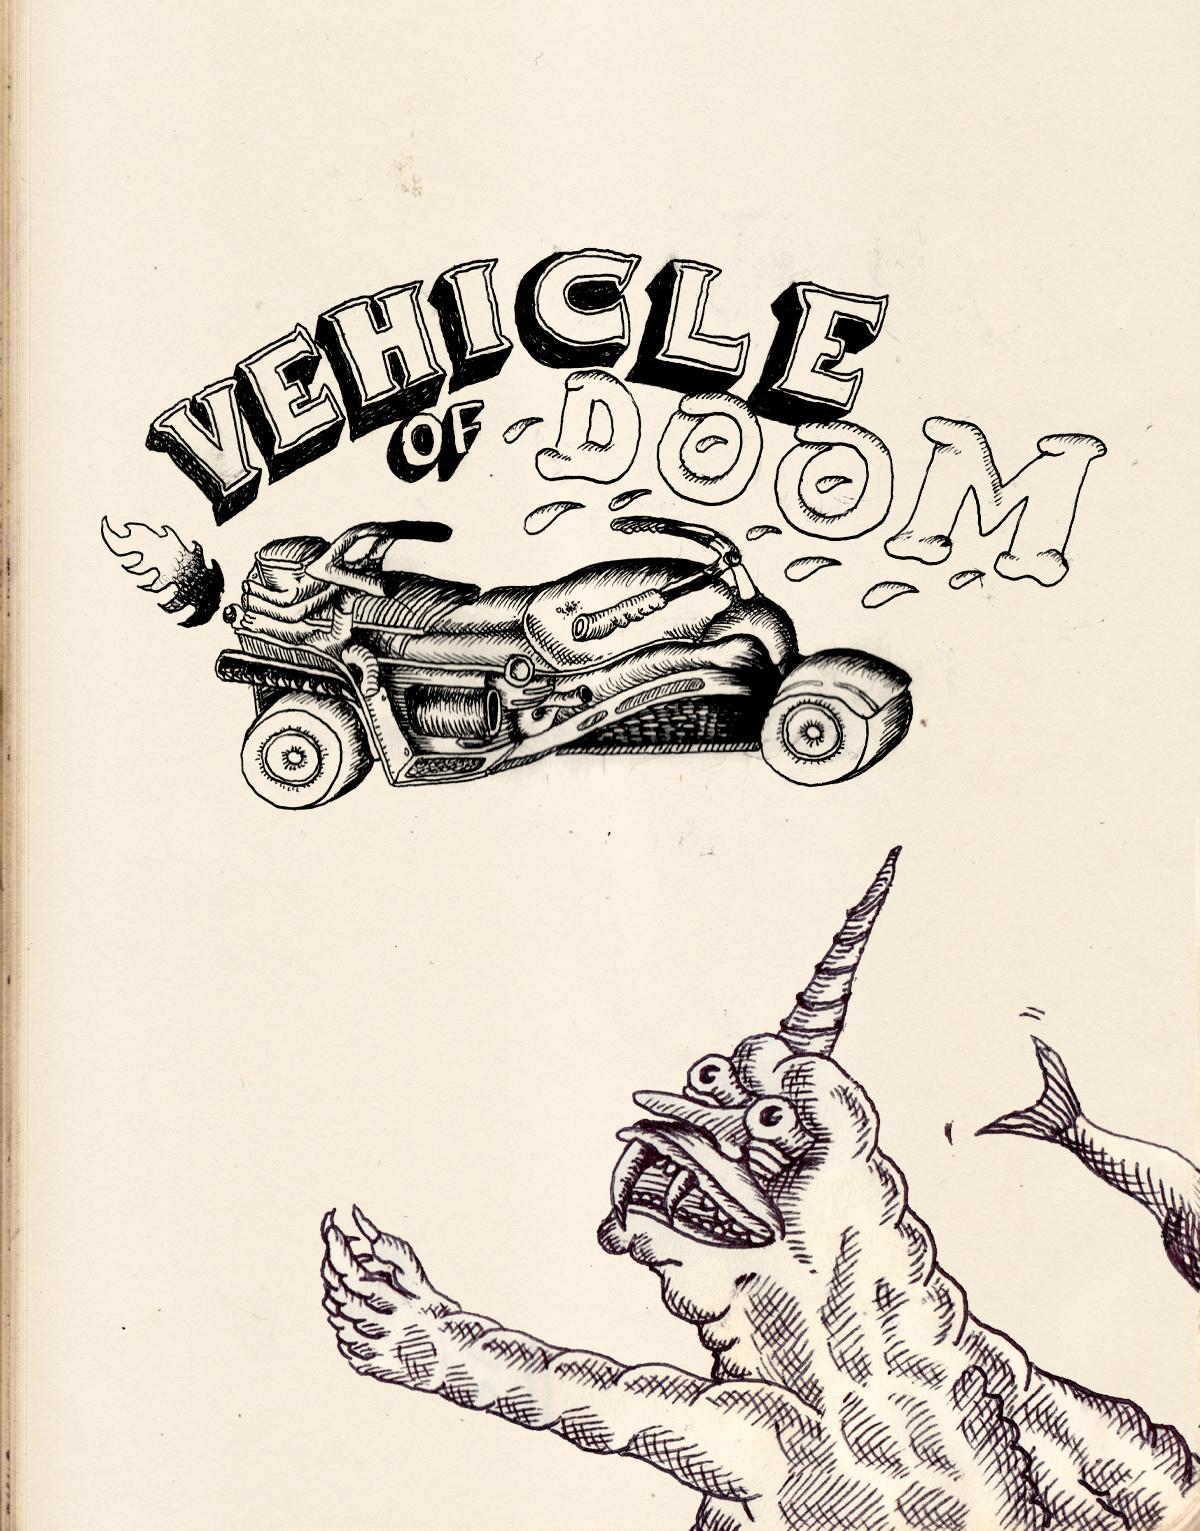 Good Italian Vehicle of Doom.